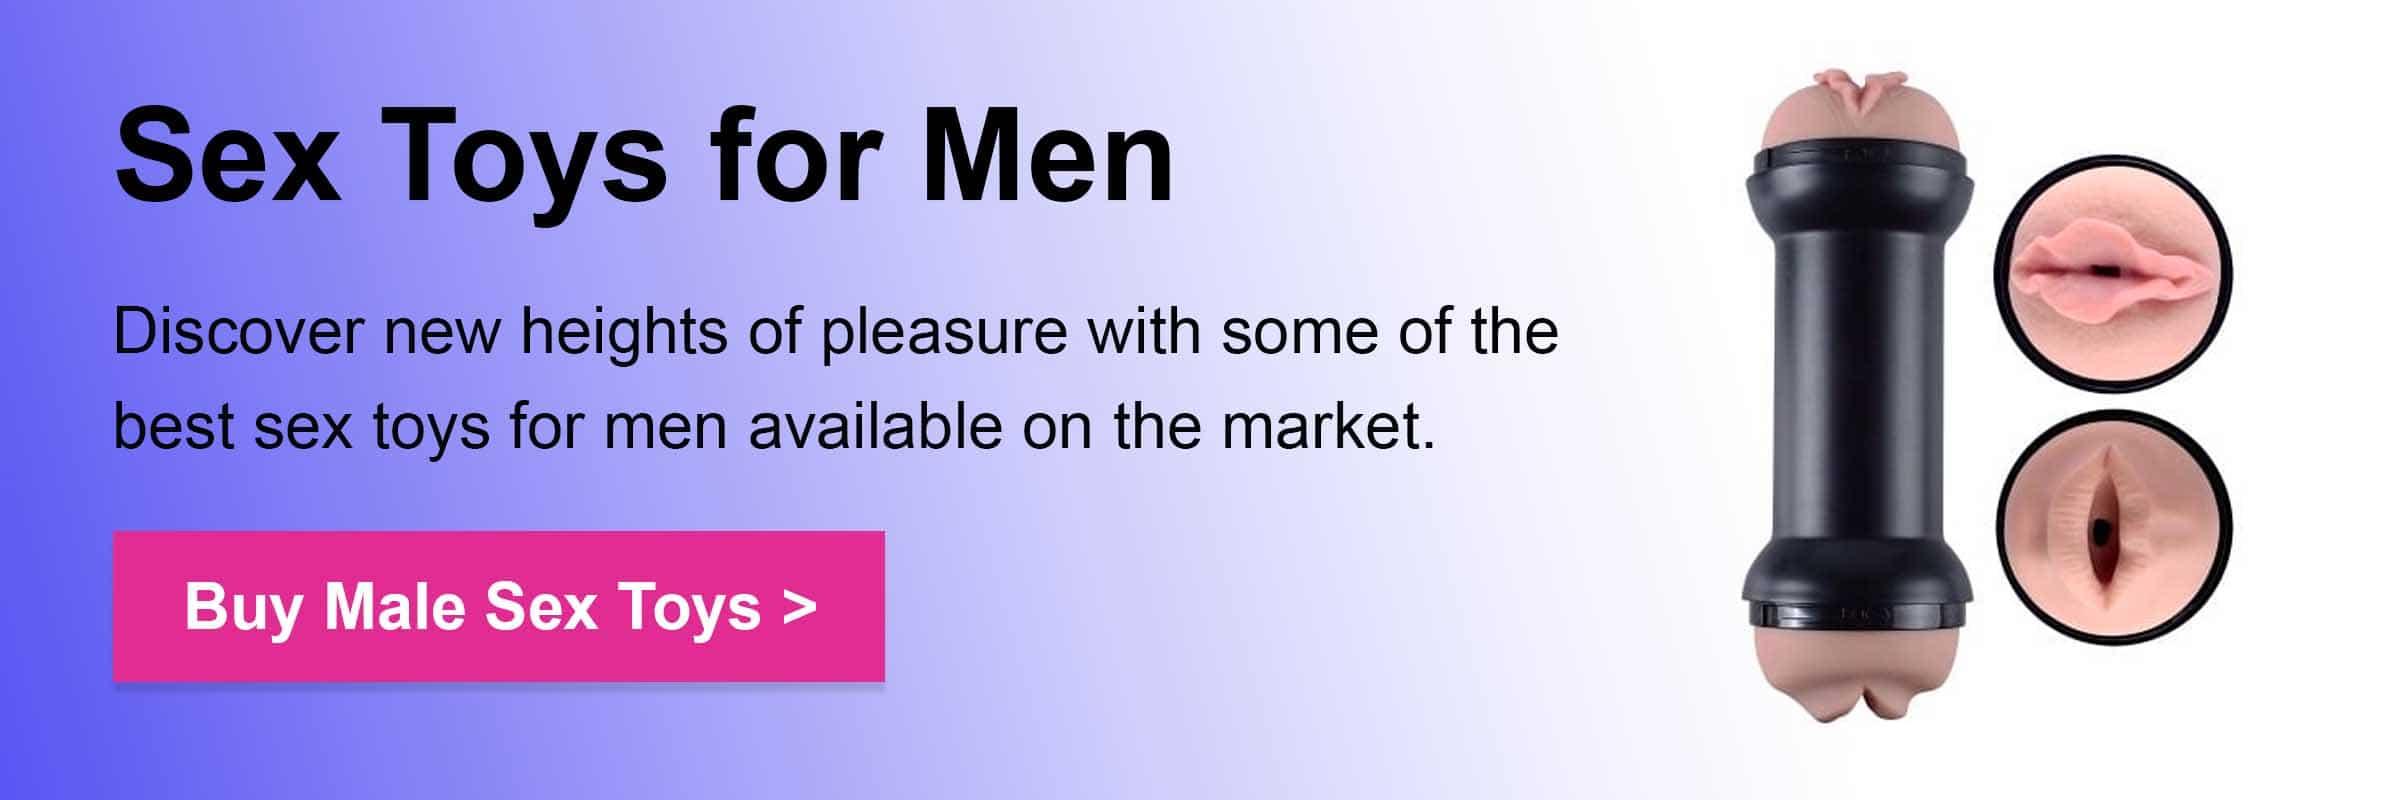 buy sex toys for men banner pulse and cocktails uk